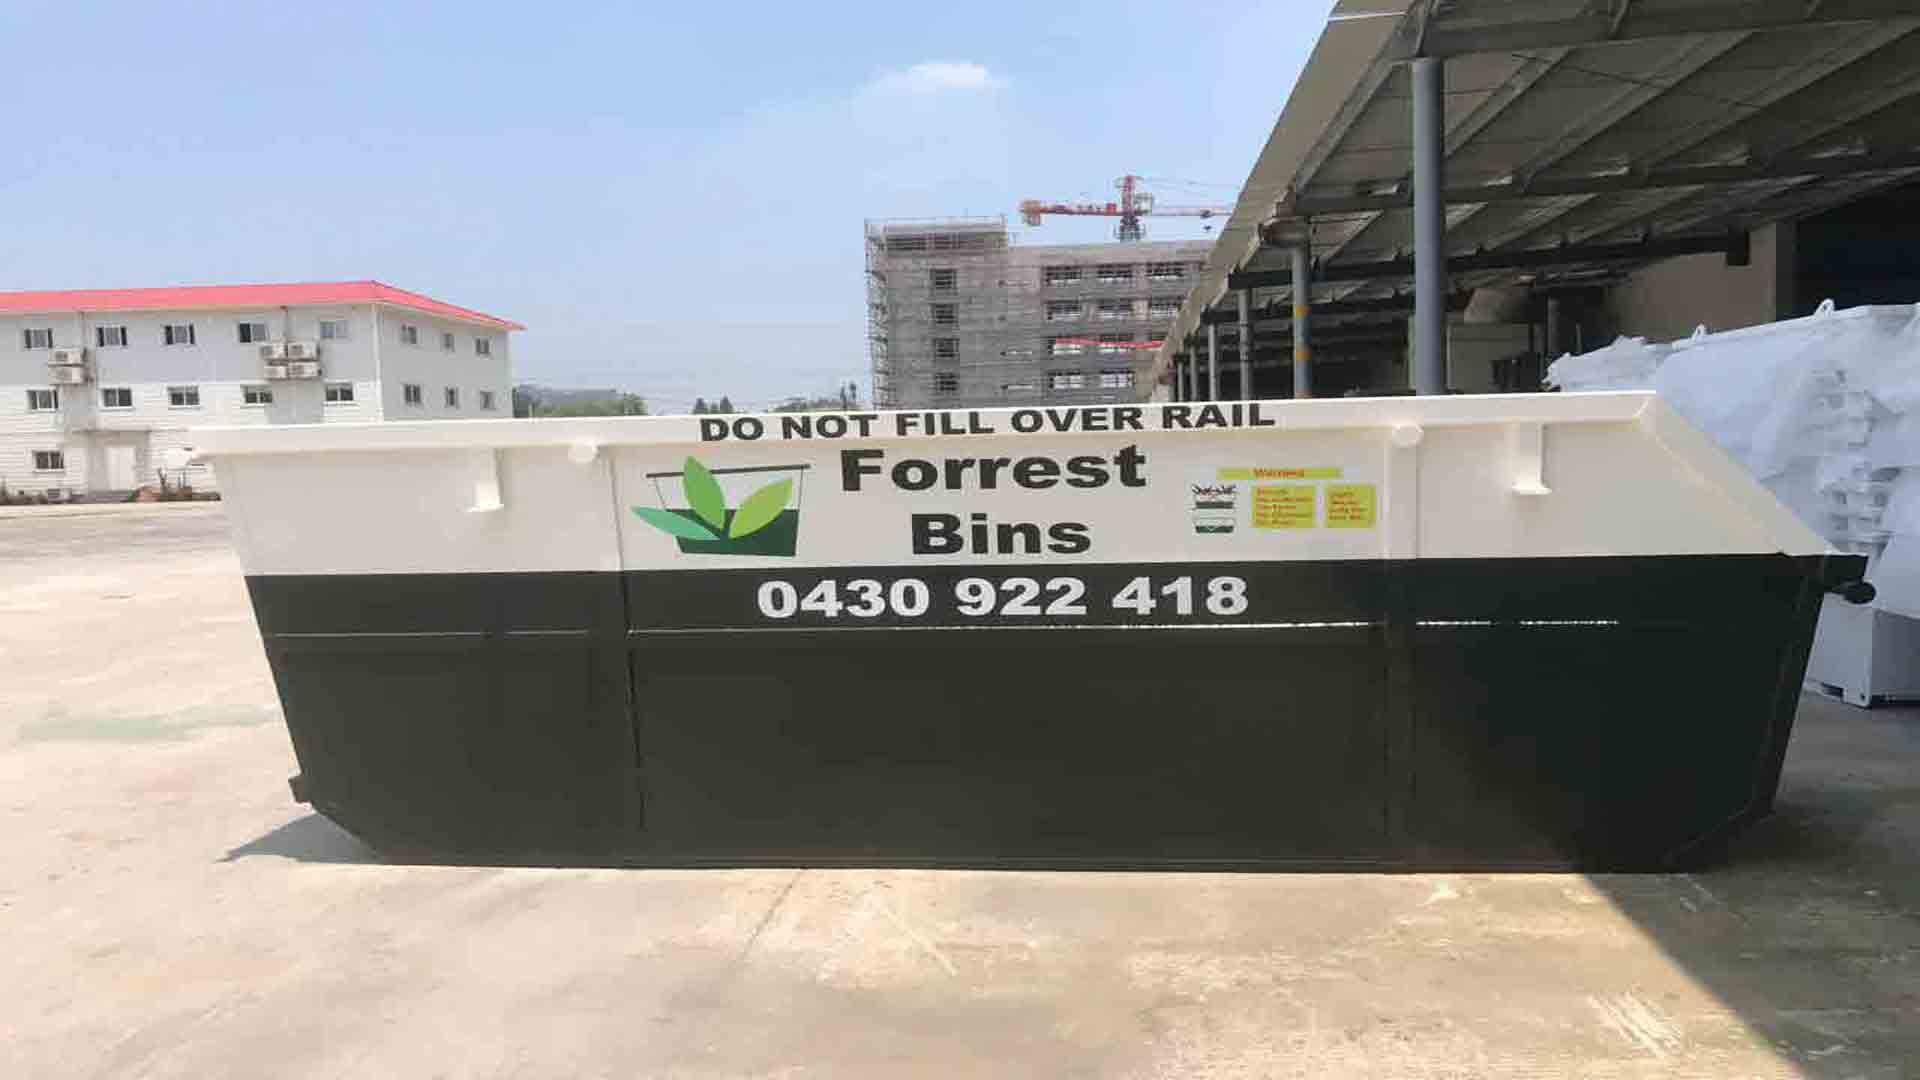 Forrest bins Forrest bins for brisbane 10-Cubic-Meter-Bin-3